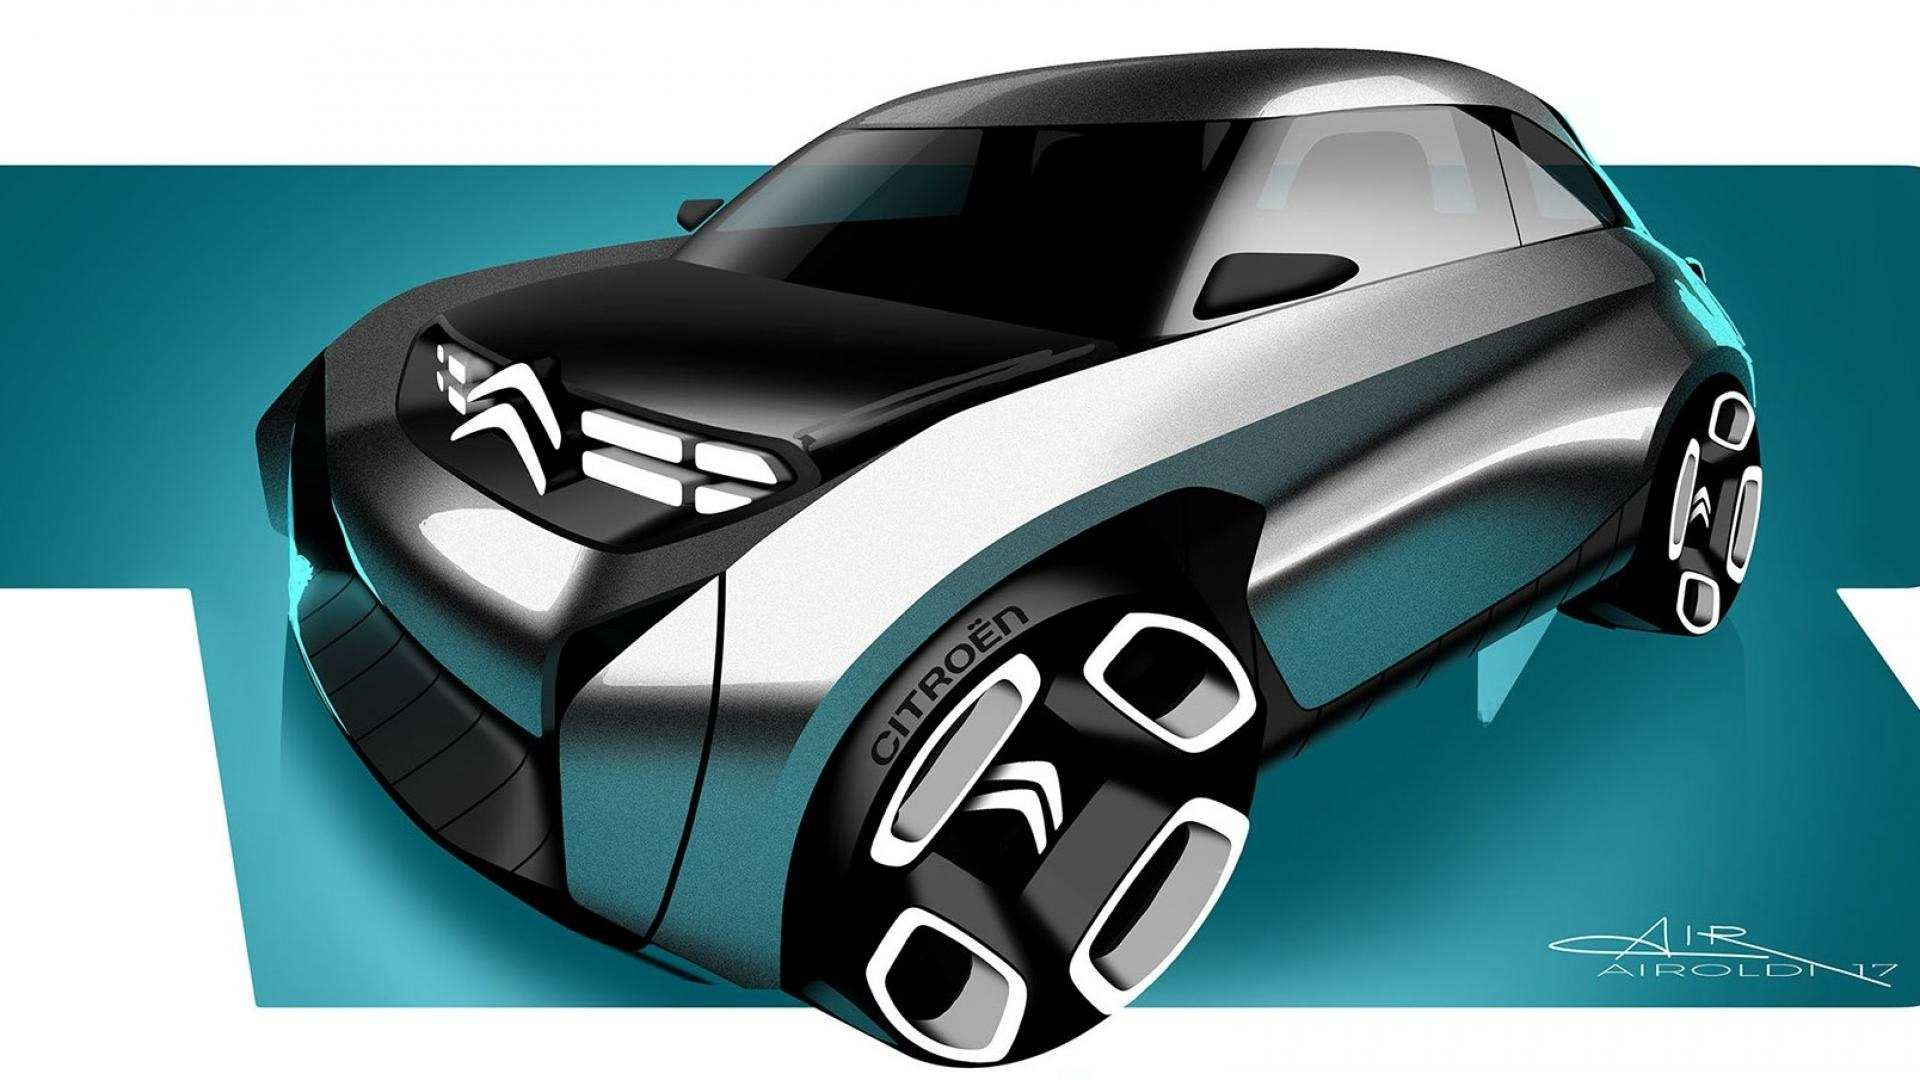 64 Concept of Citroen C1 2020 Prices for Citroen C1 2020